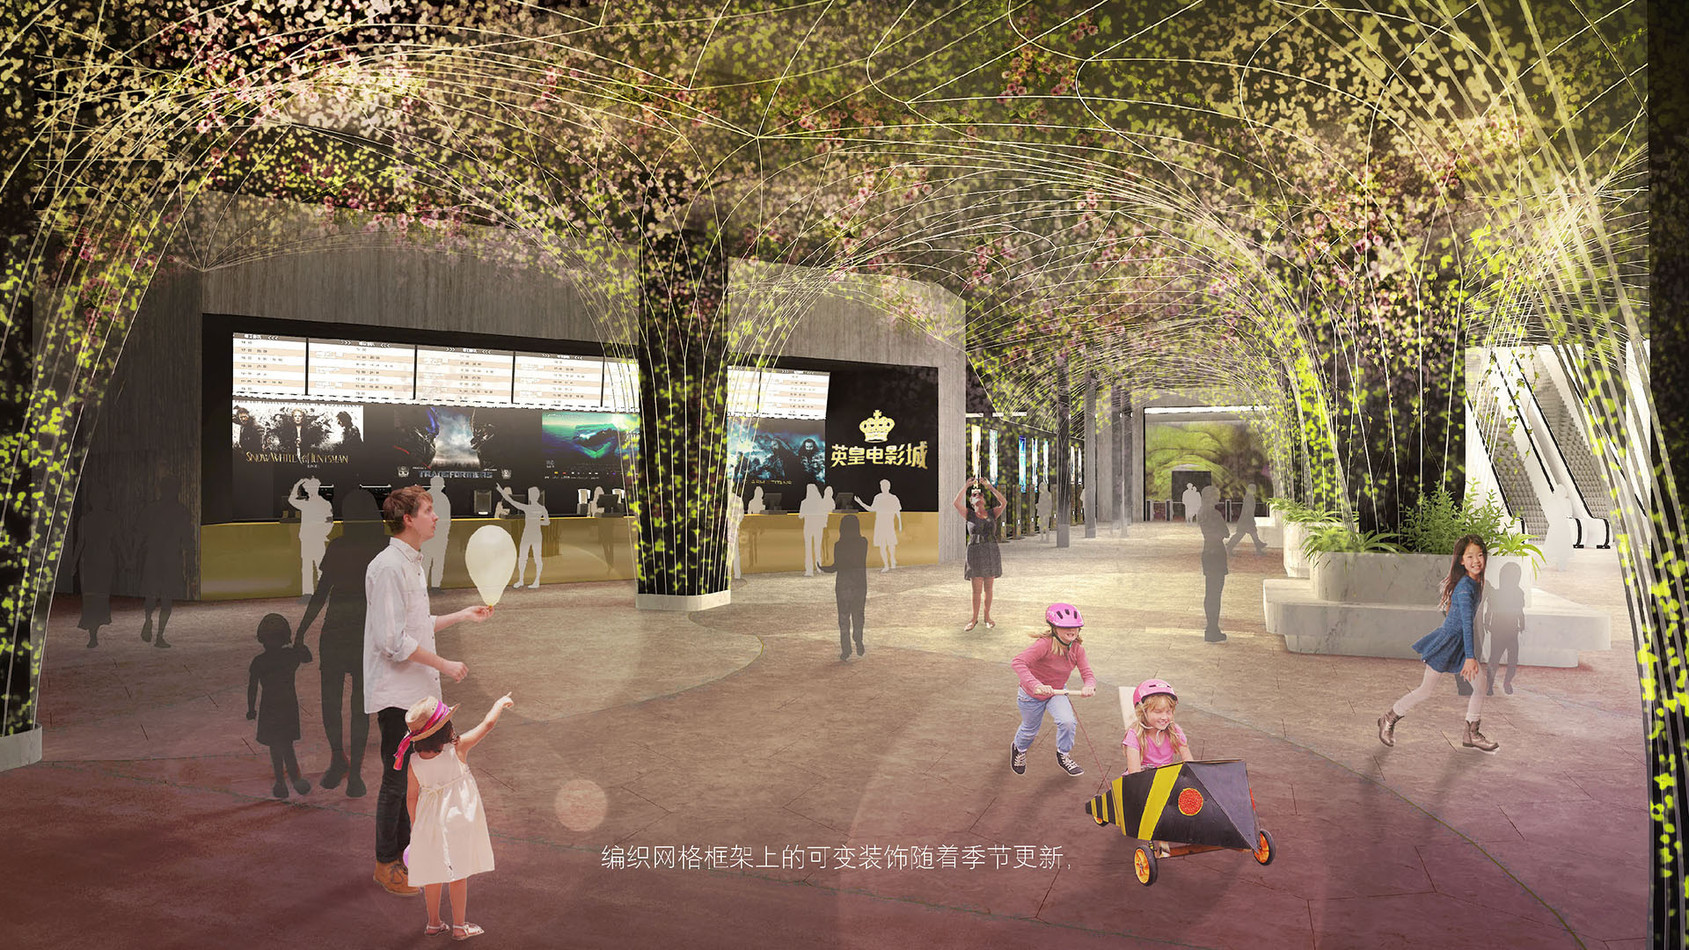 CHONGQING-EMPEROR-CINEMA-ZH 06.jpg